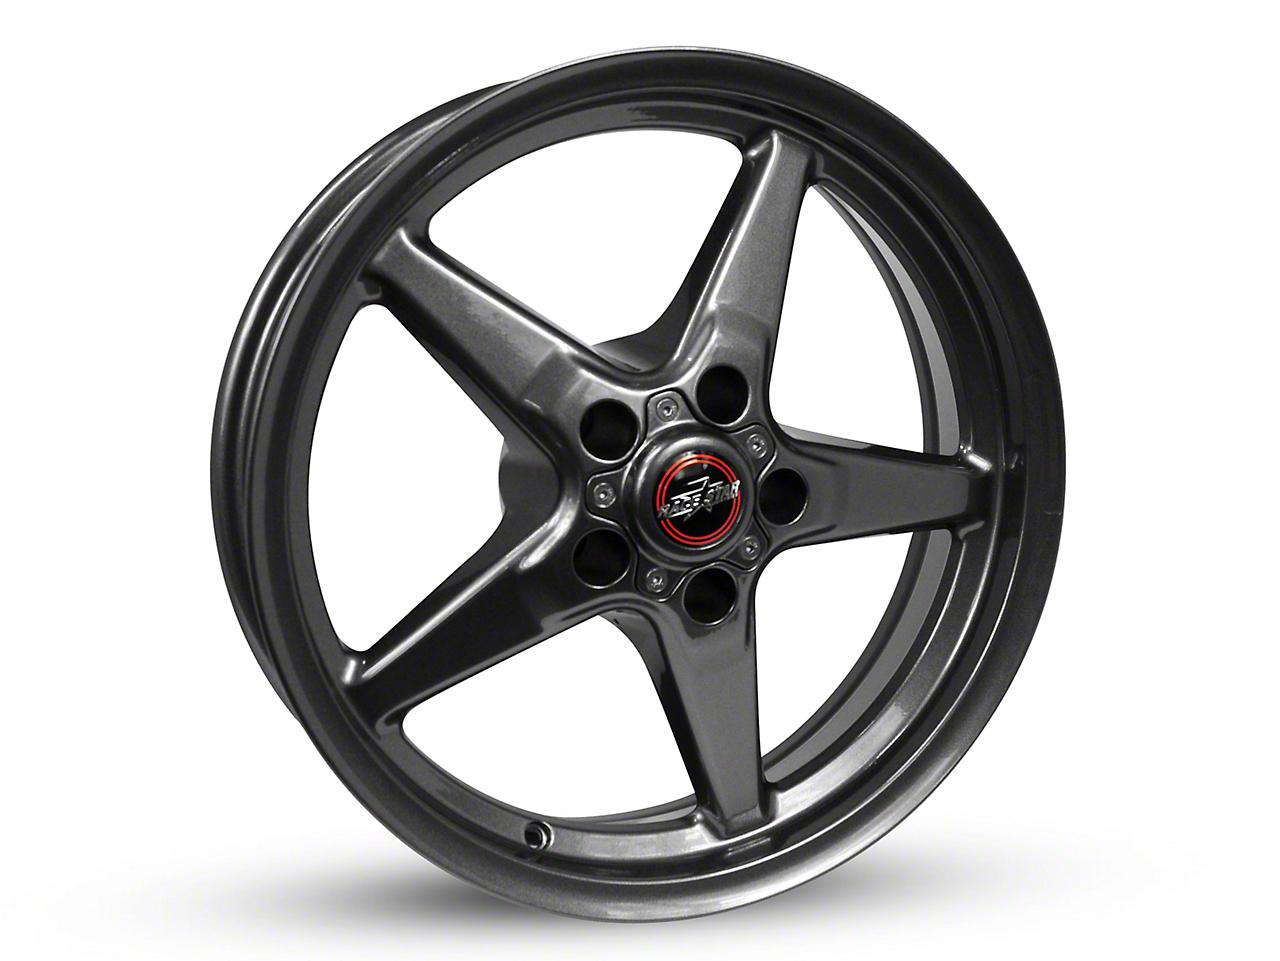 Race Star 92 Drag Star Bracket Racer Metallic Gray Wheel - 15x8 (87-93 w/ 5 Lug Conversion)